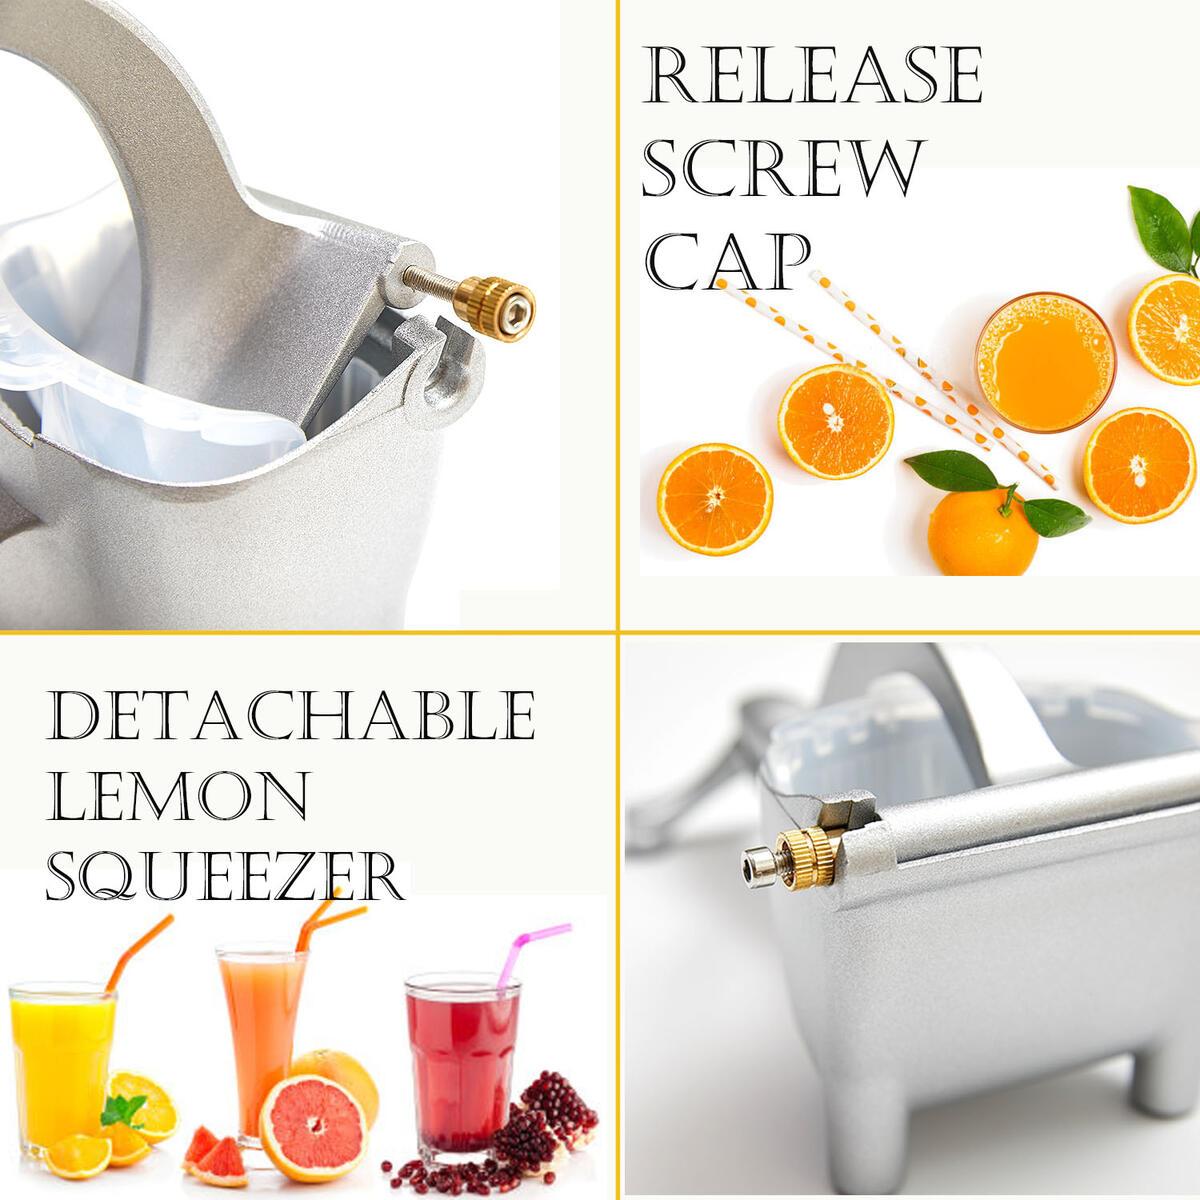 Manual Fruit Juicer With Detachable Liner Hand Press Teflon Citrus Juicer Fruit Juicer Premium Quality Metal Aluminum alloy Lemon Squeezer with 5 pcs Filter Bags and 1 Fruit Clip Silver Manual Juicer, DIDU